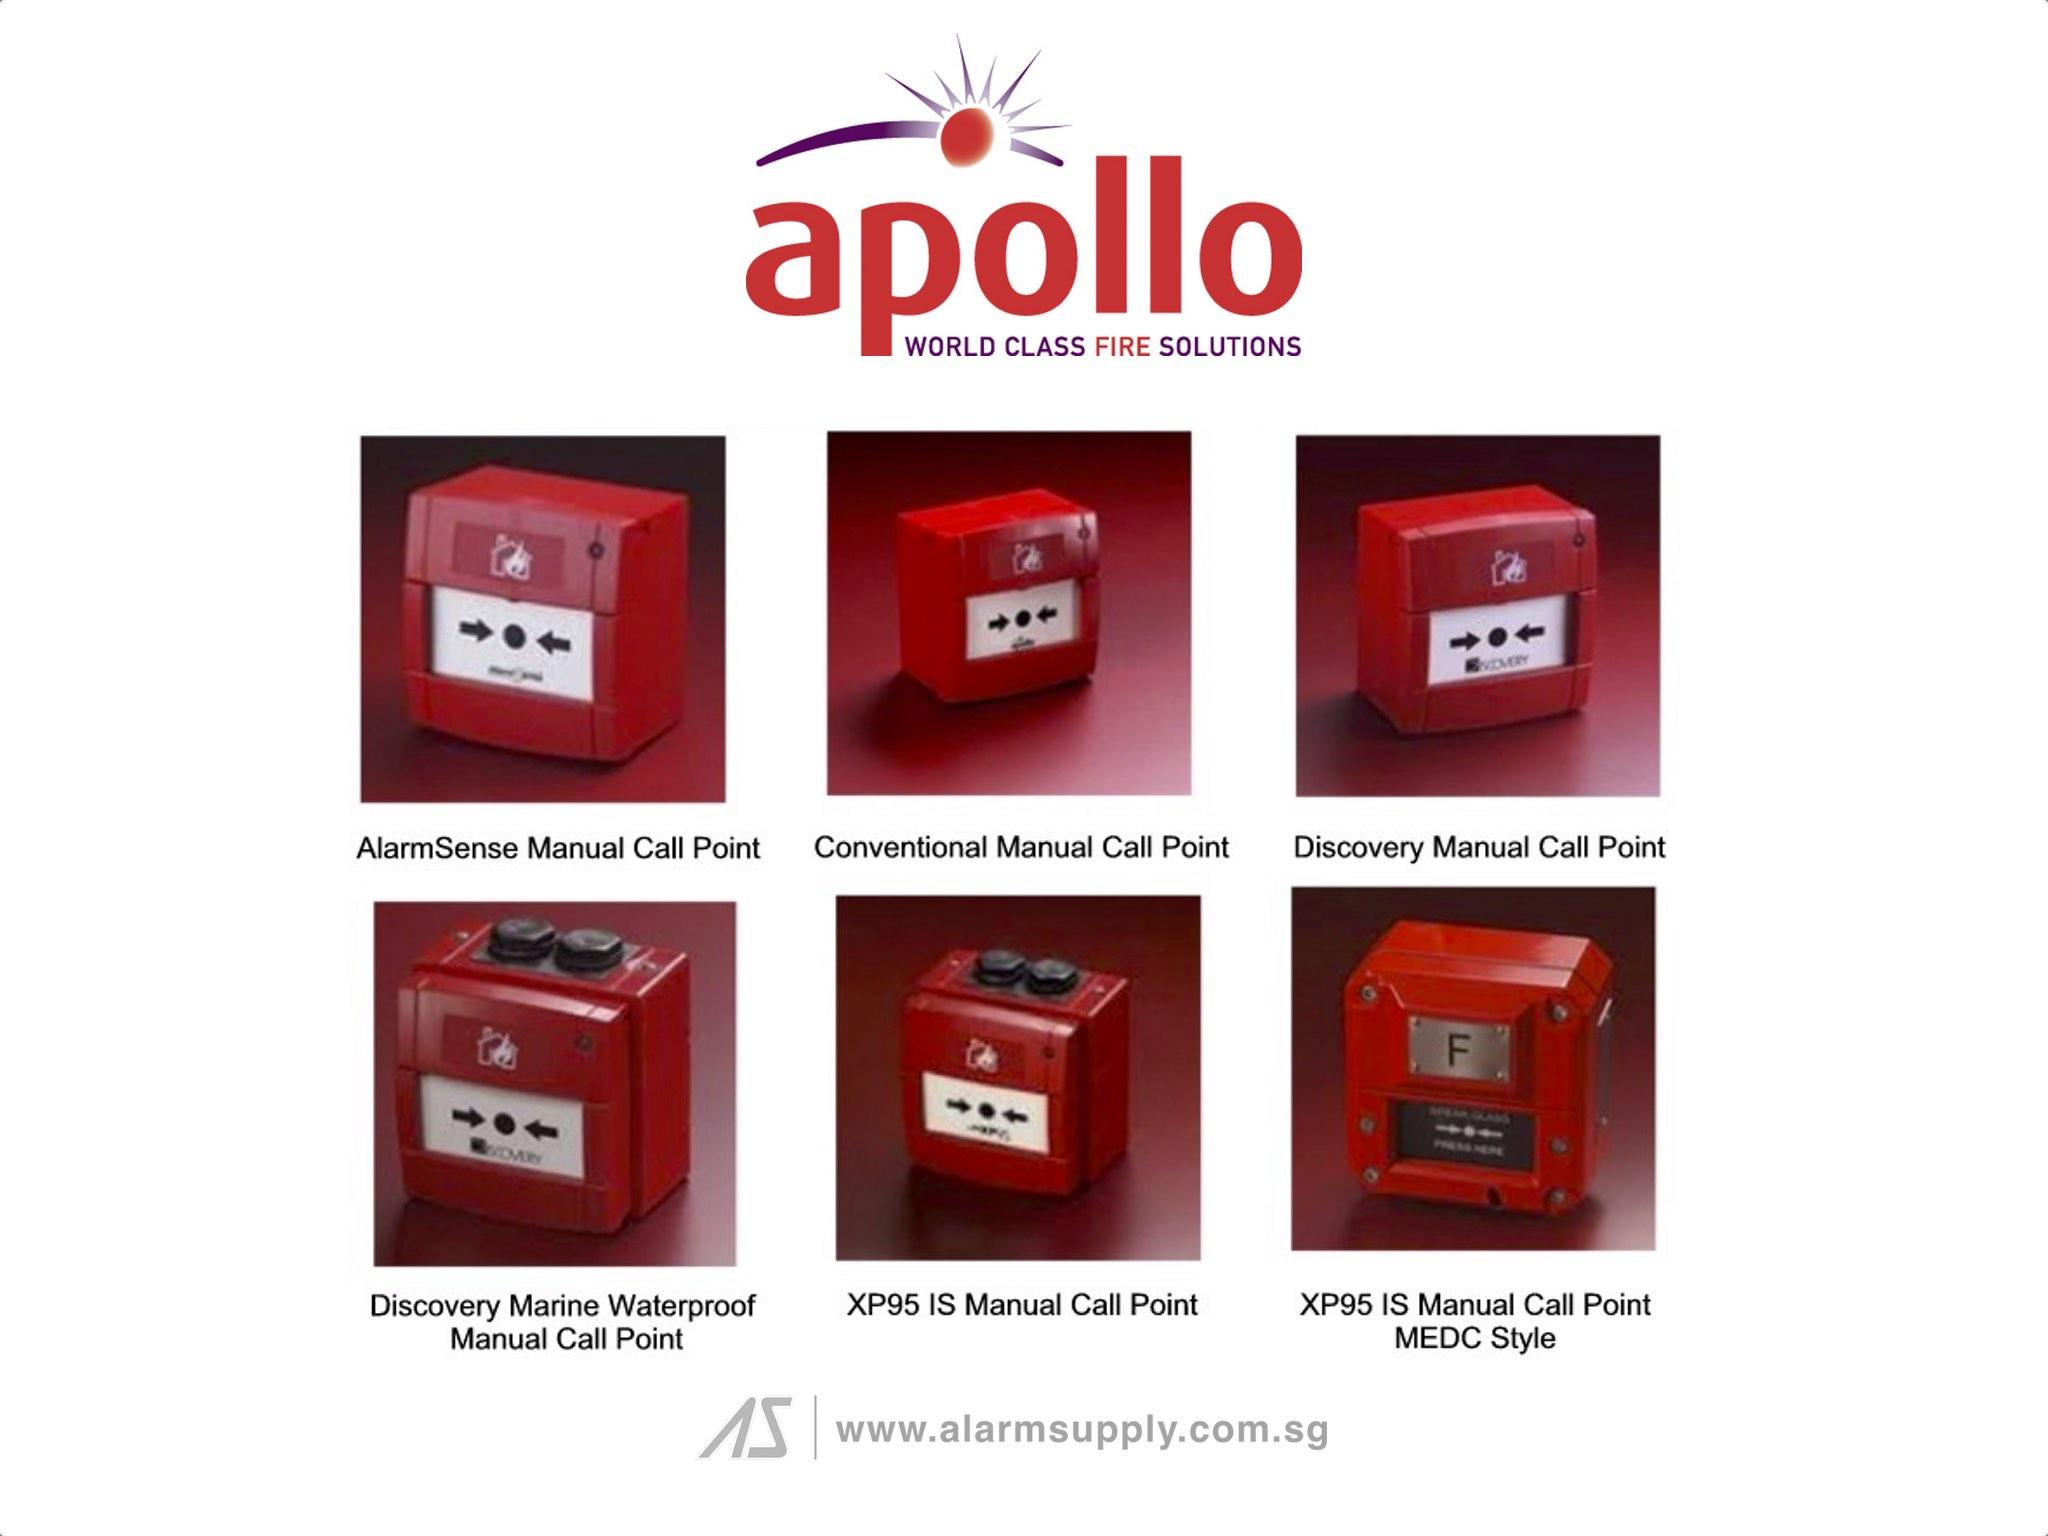 apollo callpoint alarm supply pte ltd apollo fire detectors limited apollo orbis smoke detector wiring diagram at webbmarketing.co